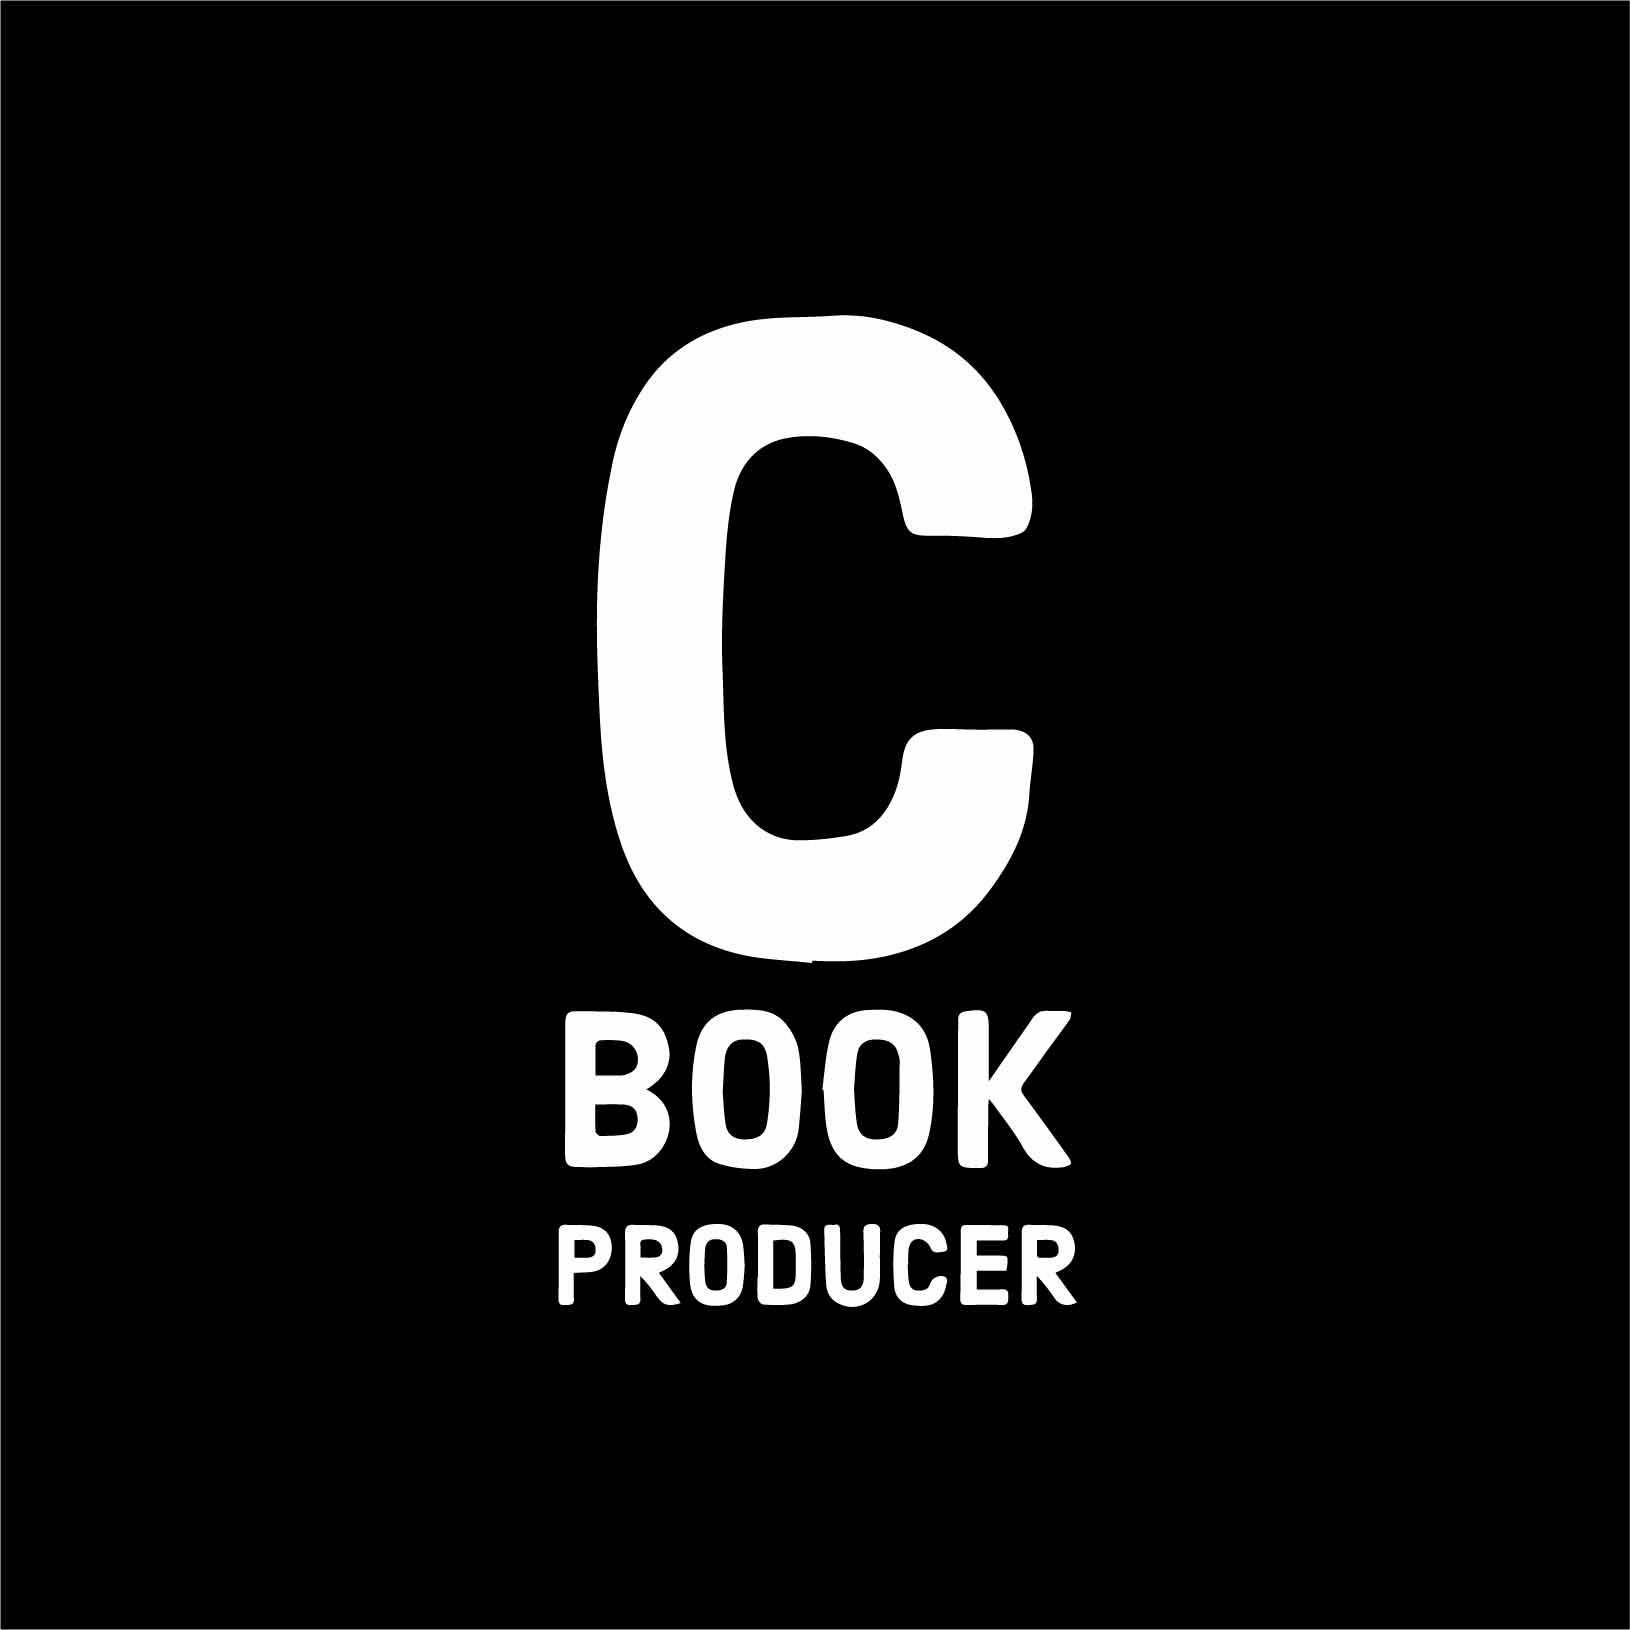 C Book Producer